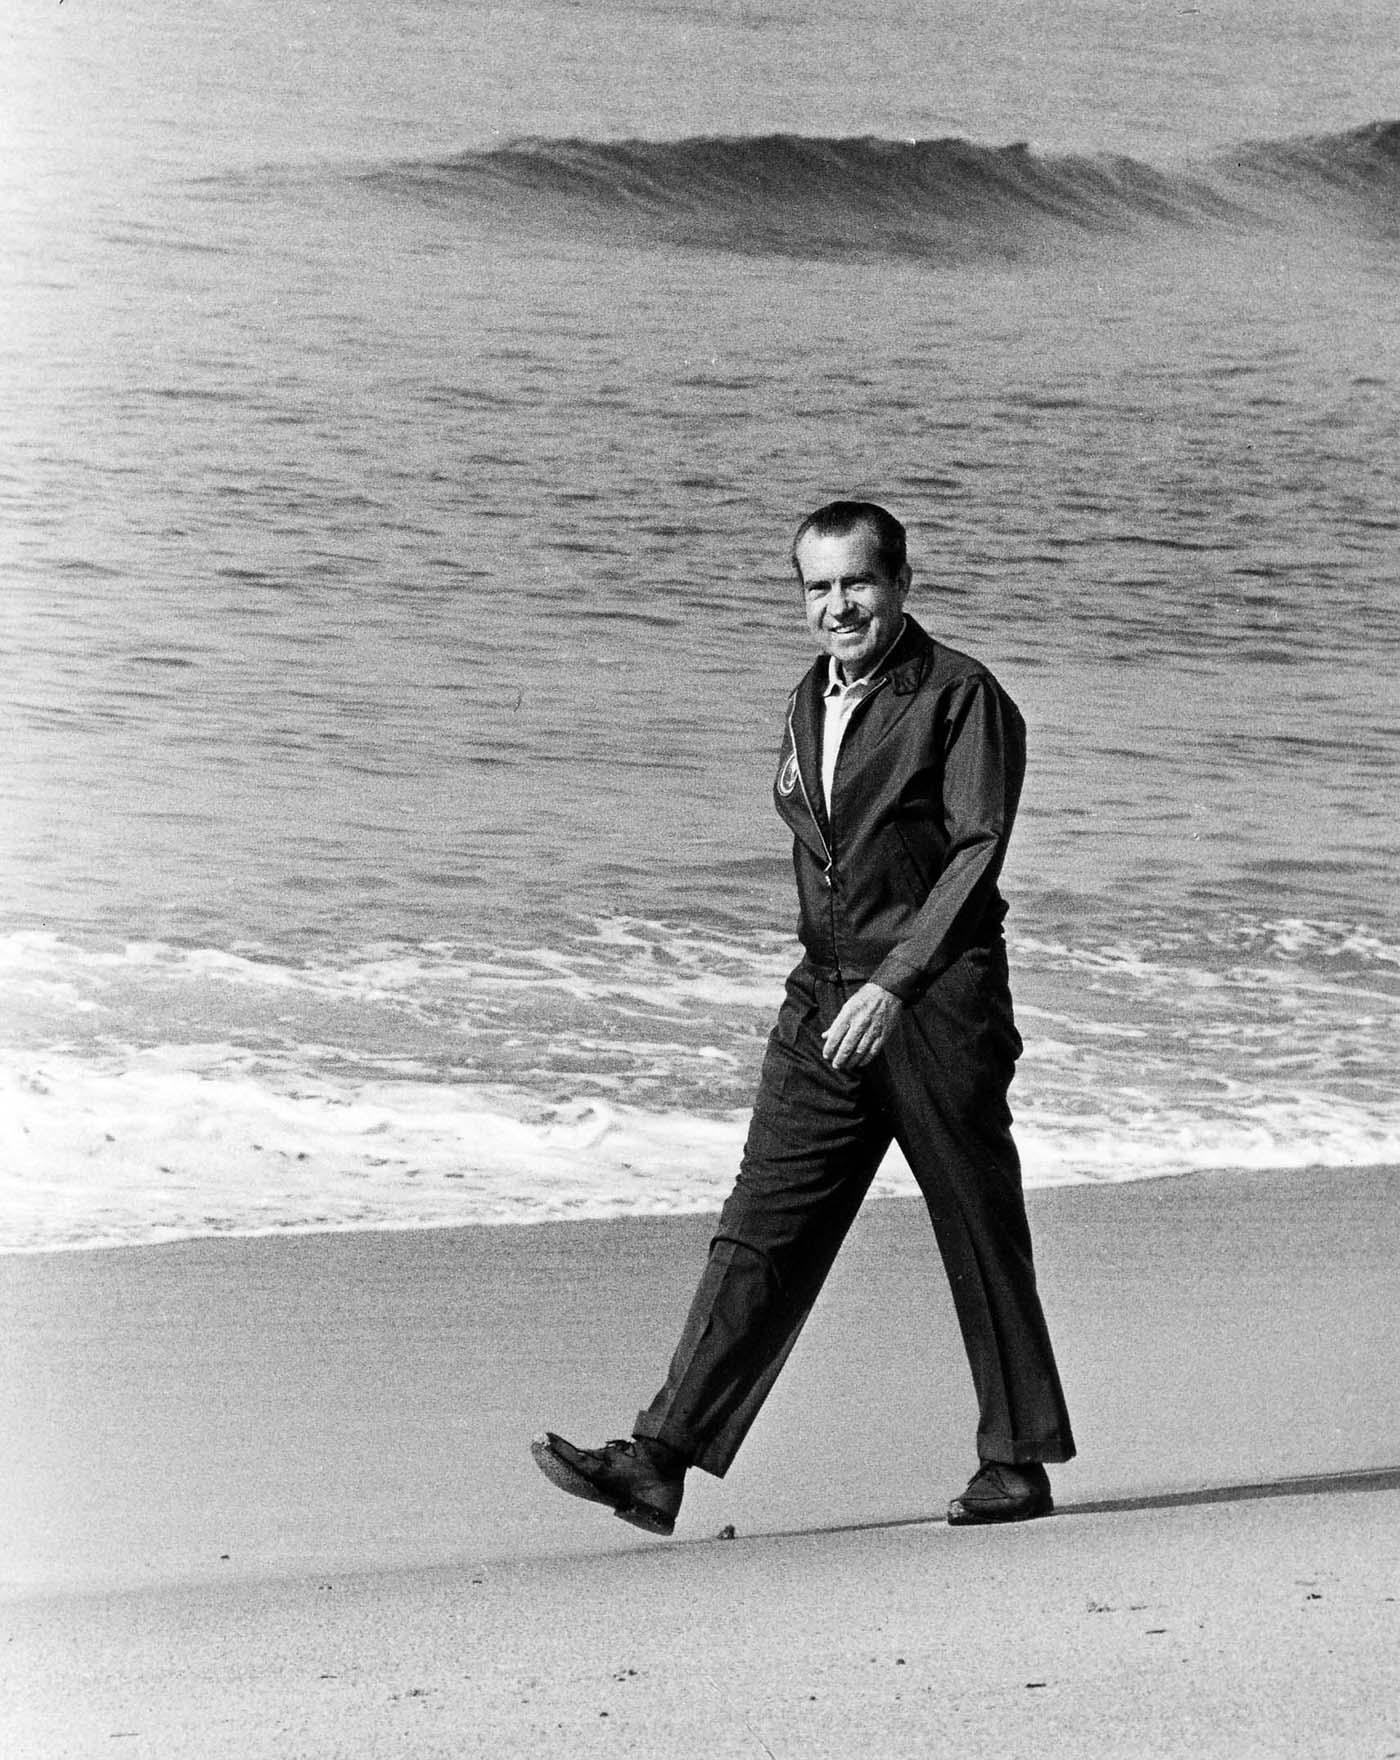 Richard Nixon walking on beach